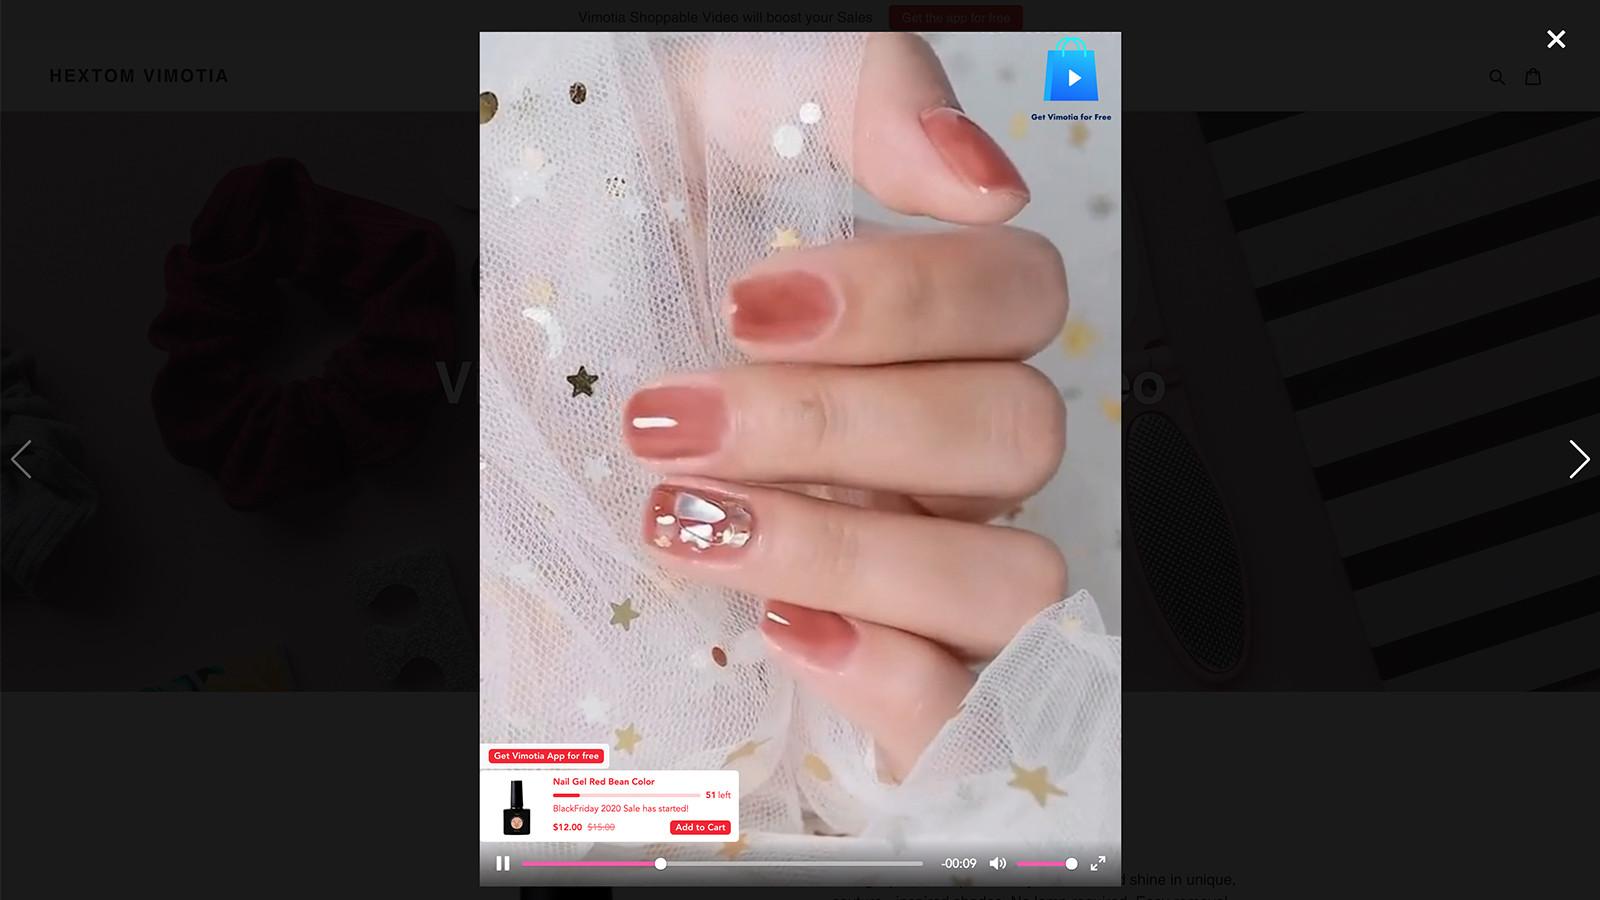 vimotia_screenshot_4